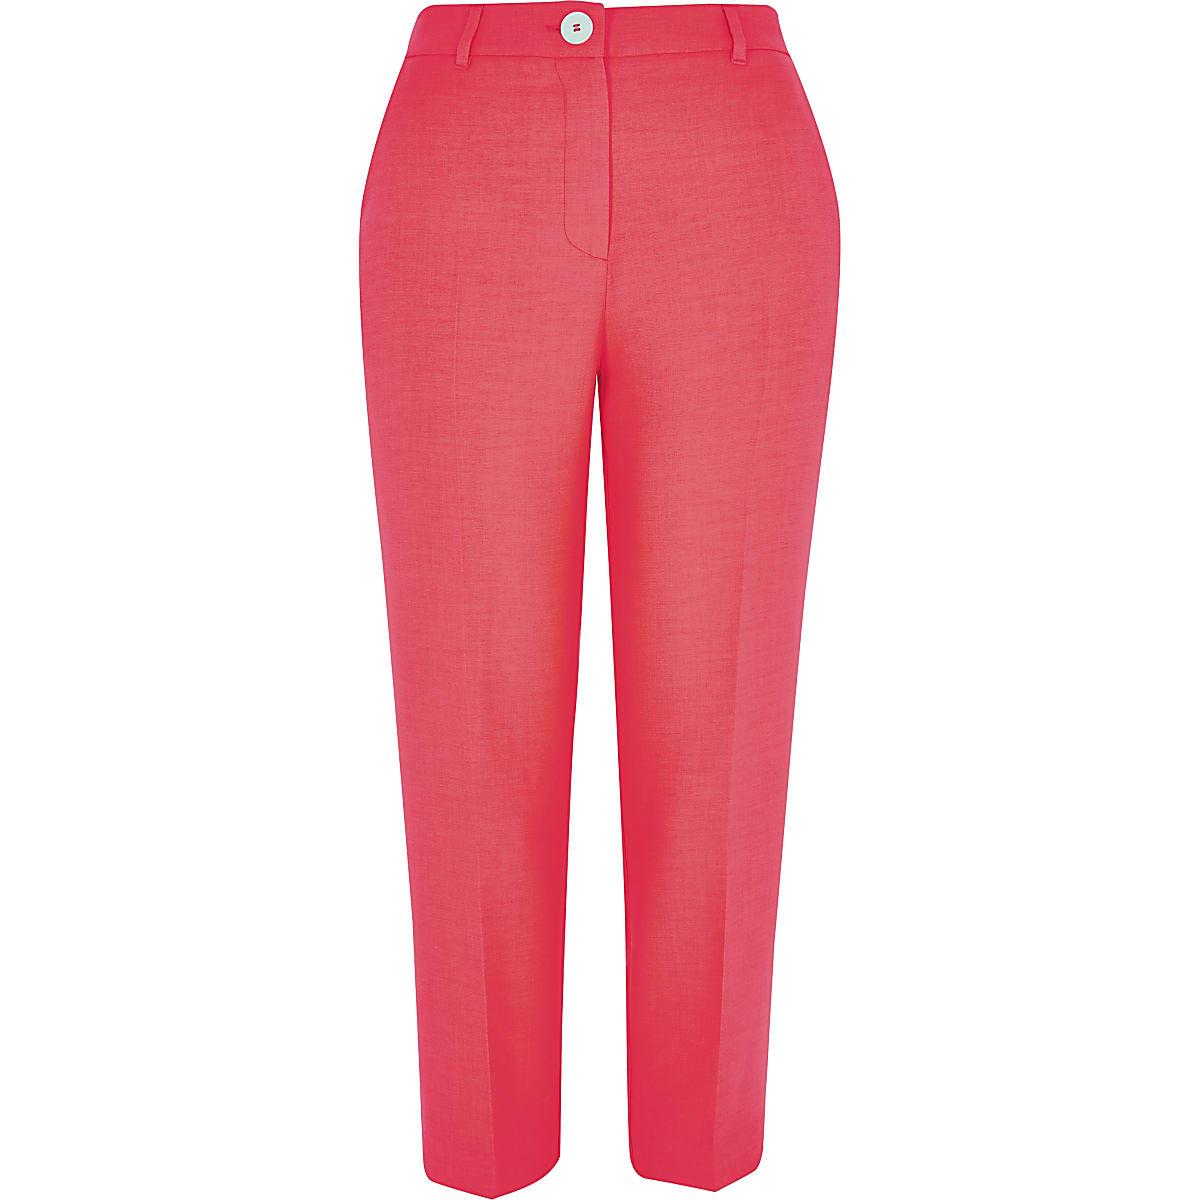 Petite neon pink cigarette trousers